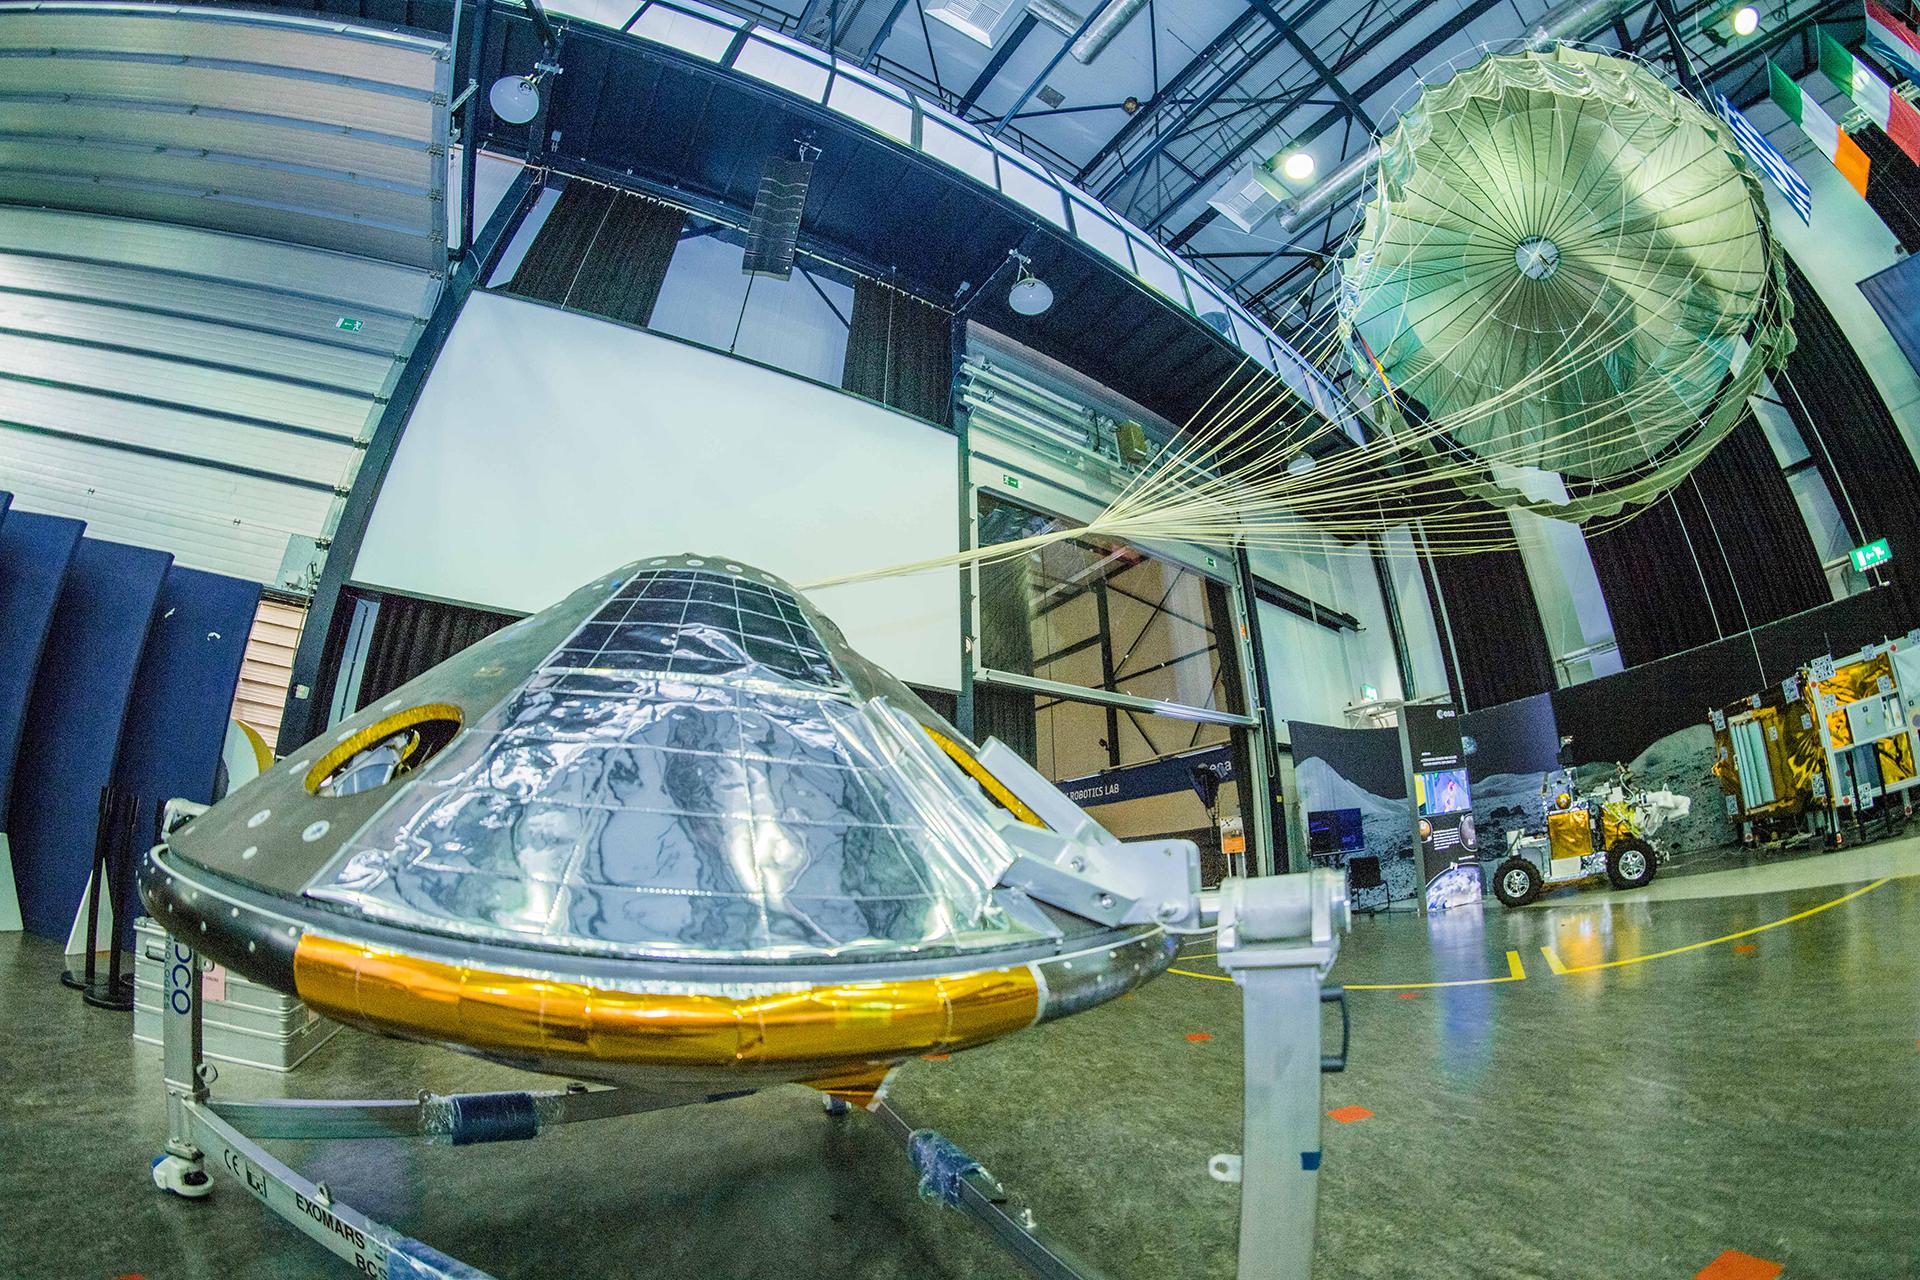 Raumfahrt astronomie blog von cenap   blog: raumfahrt   esa ...